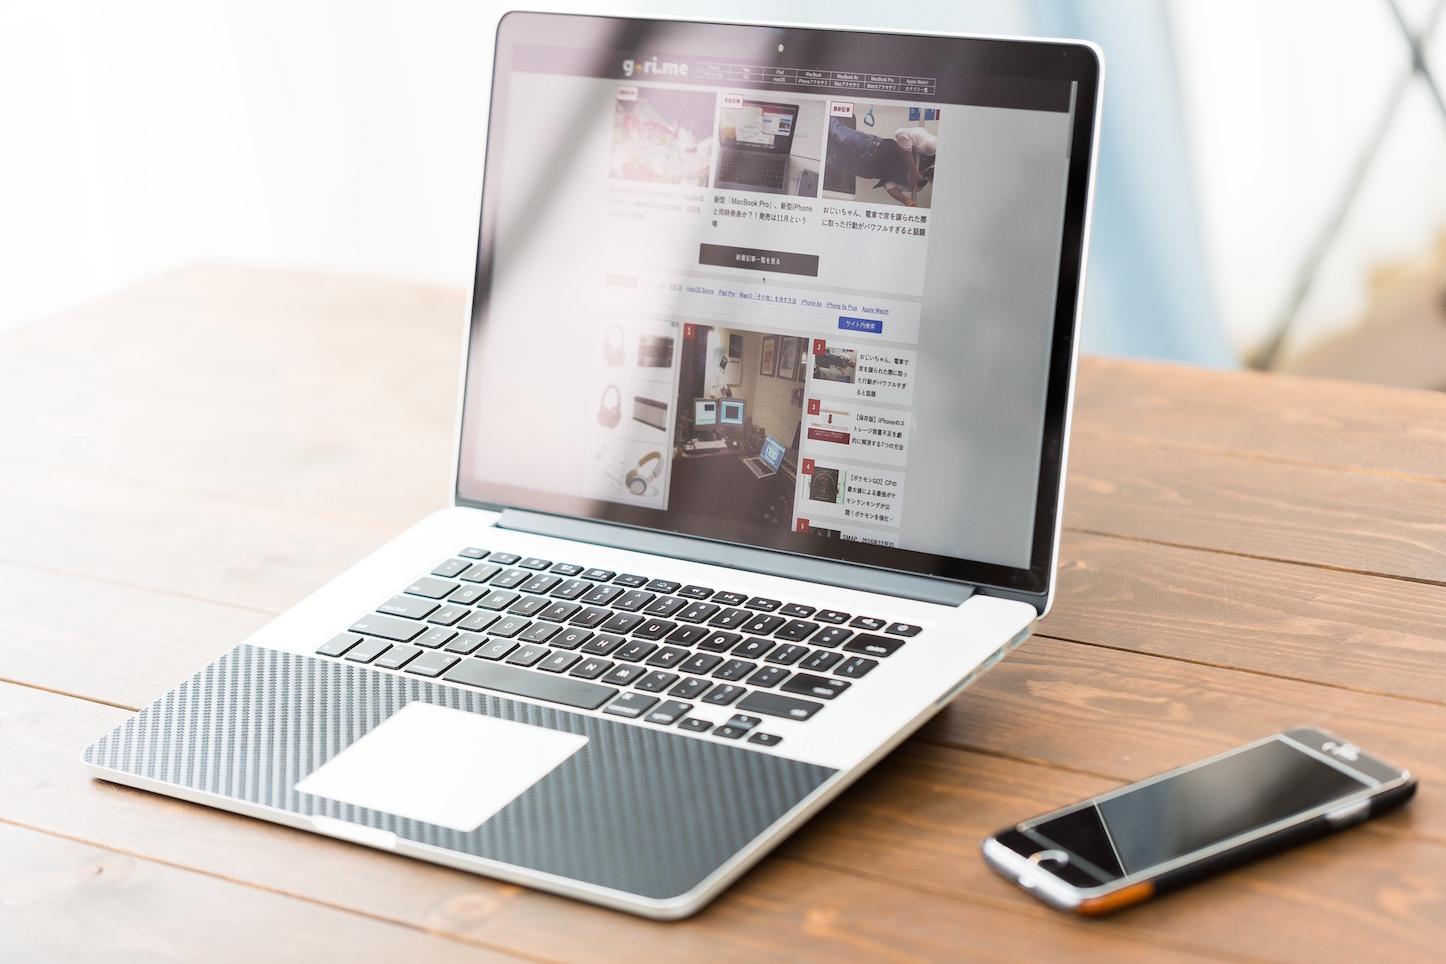 macbook-pro-and-iphone-6s-plus.jpg